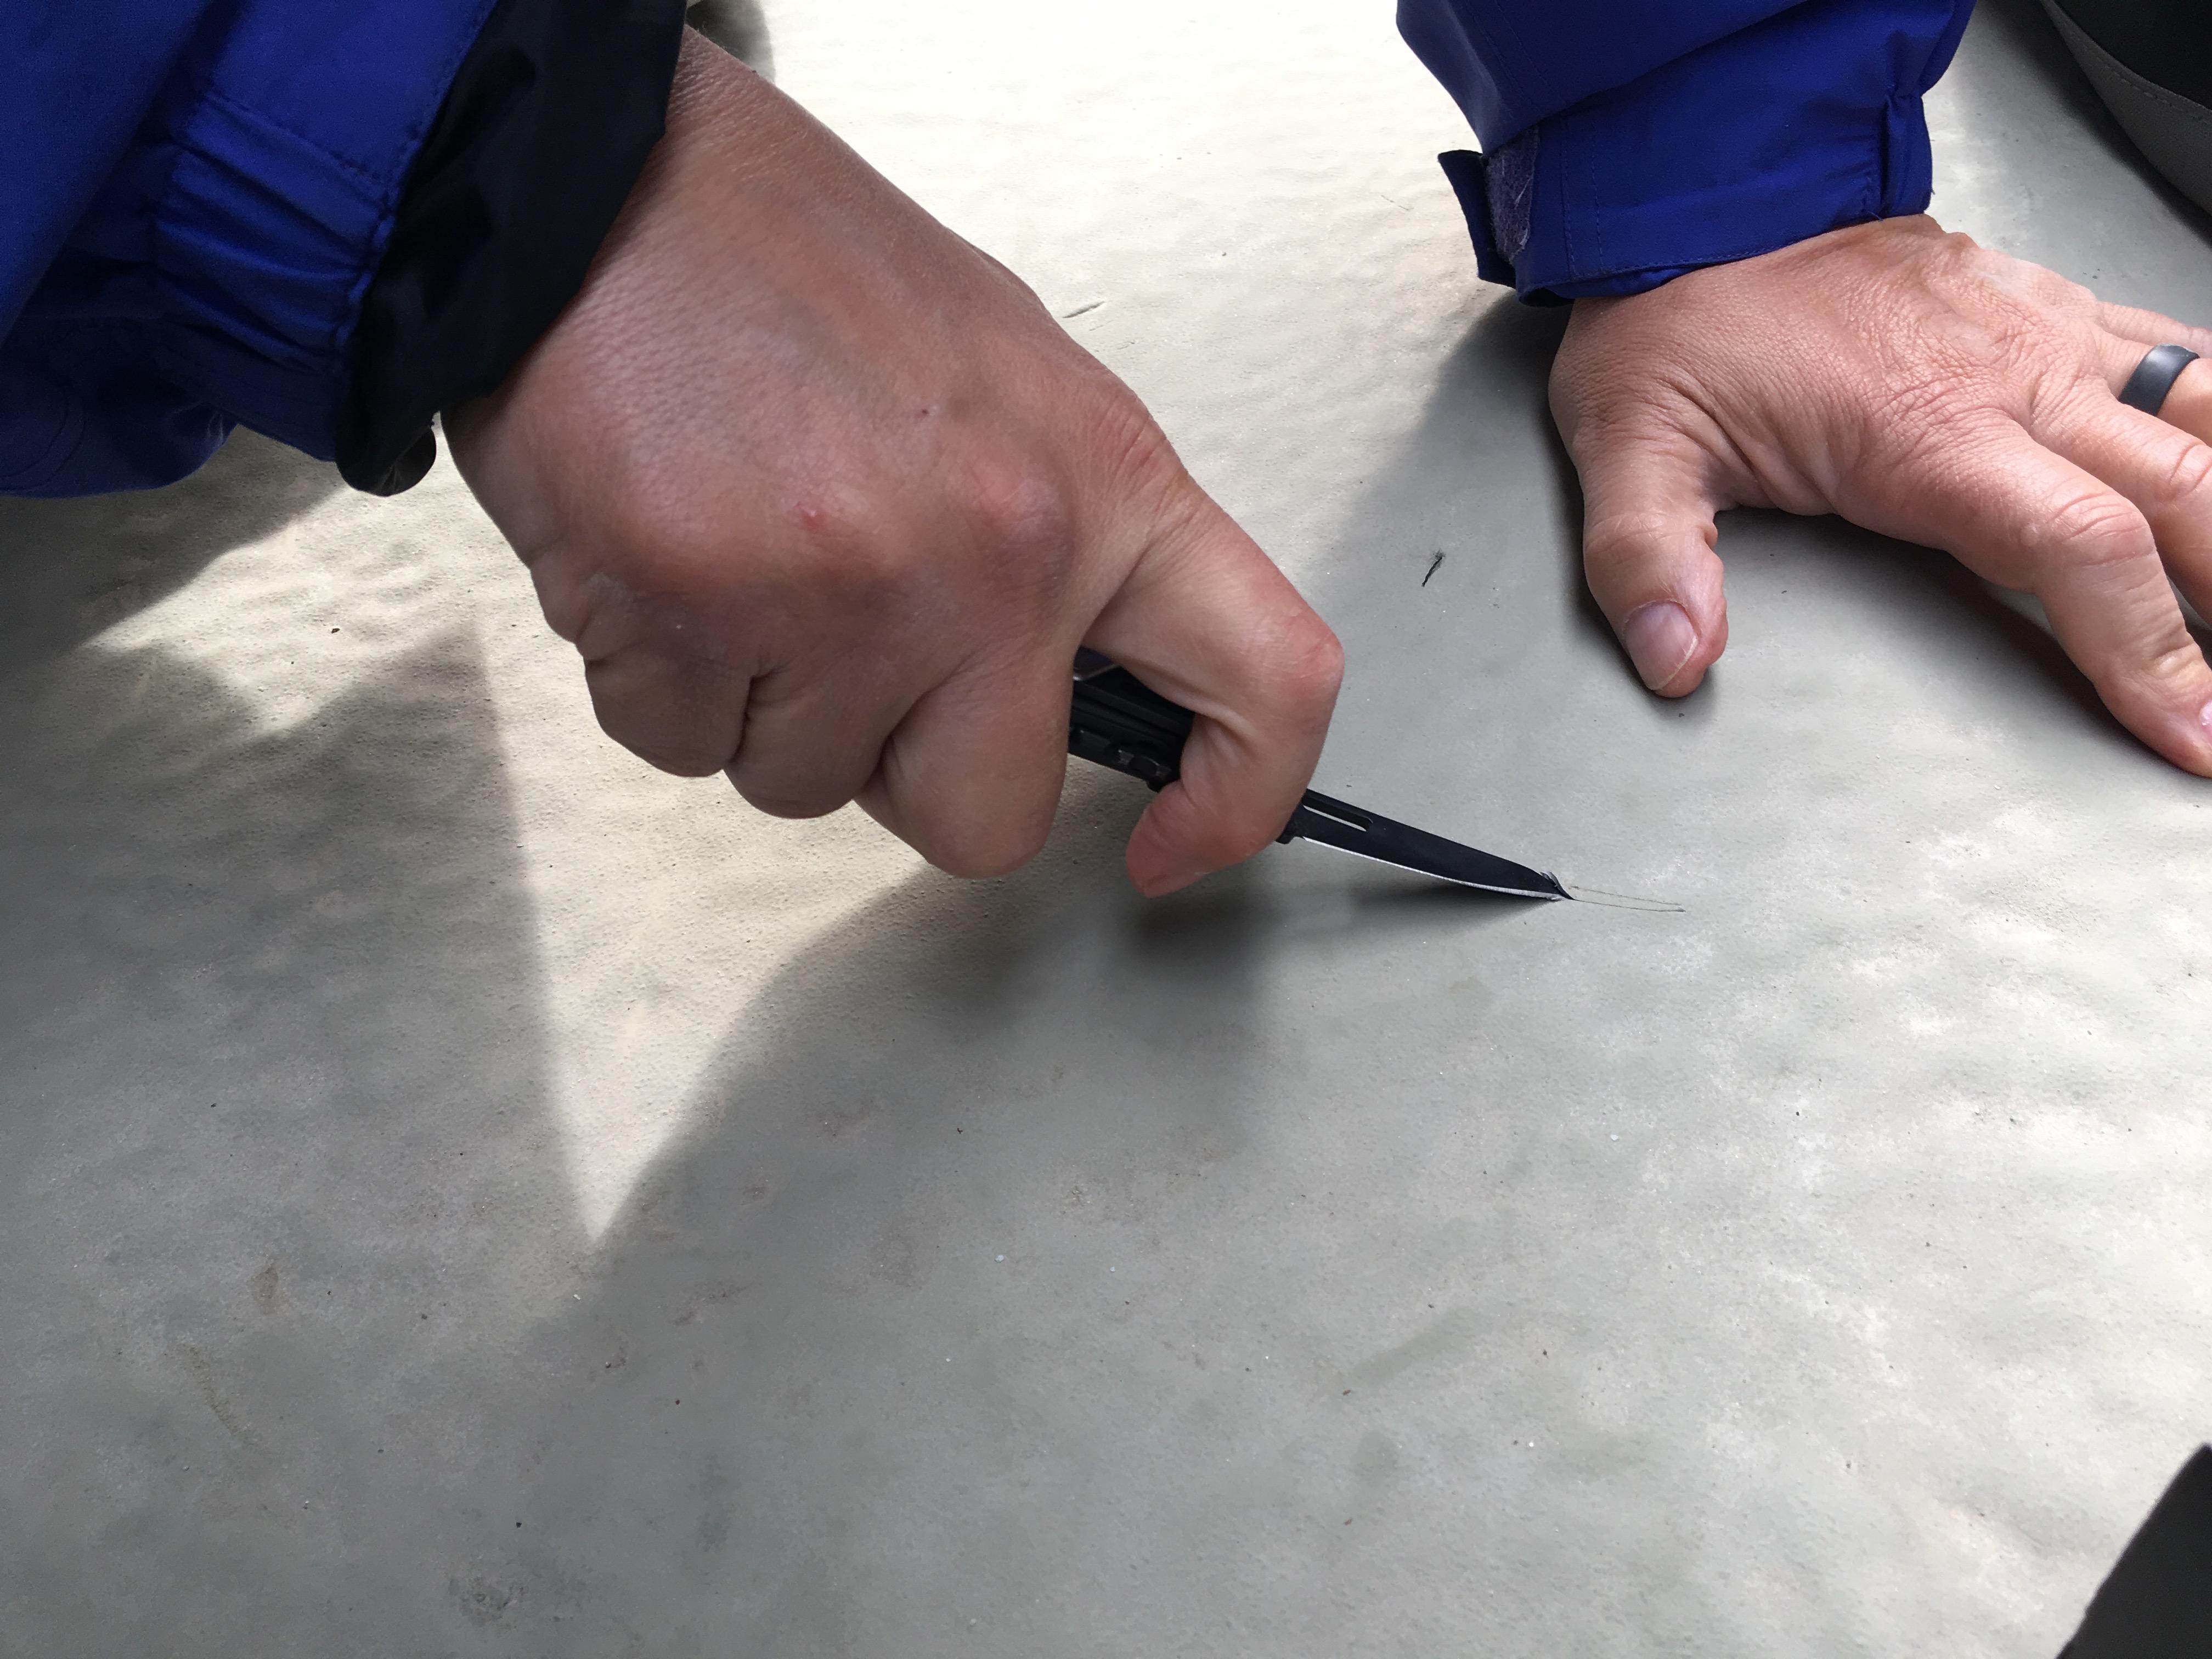 Qualitative adhesive/cohesive testing